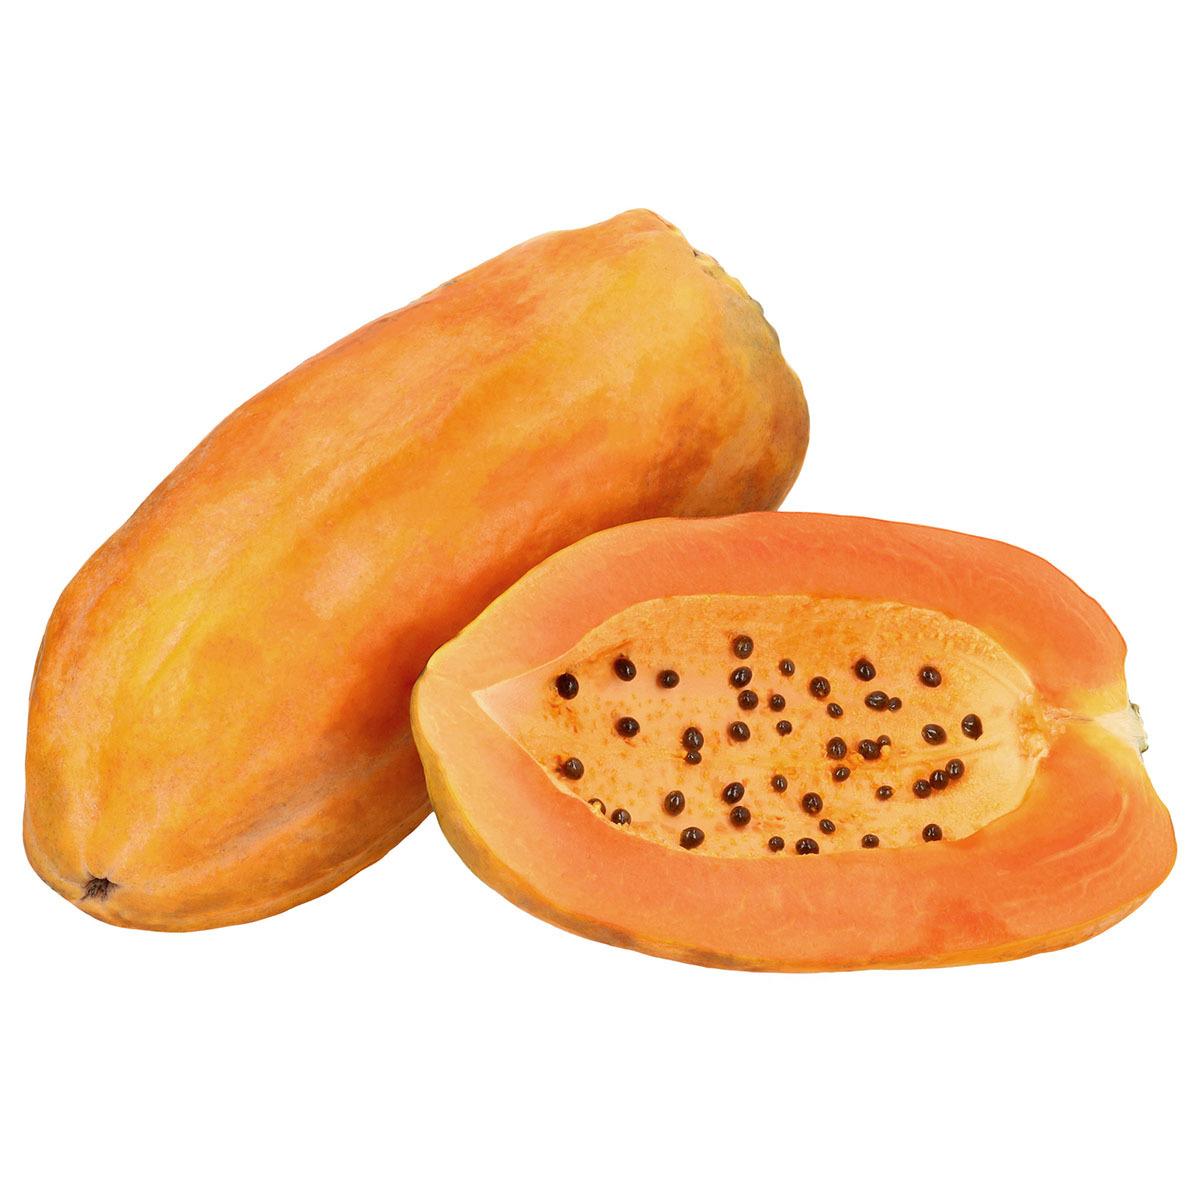 Chedraui: Papaya Maradol $17.90 kg